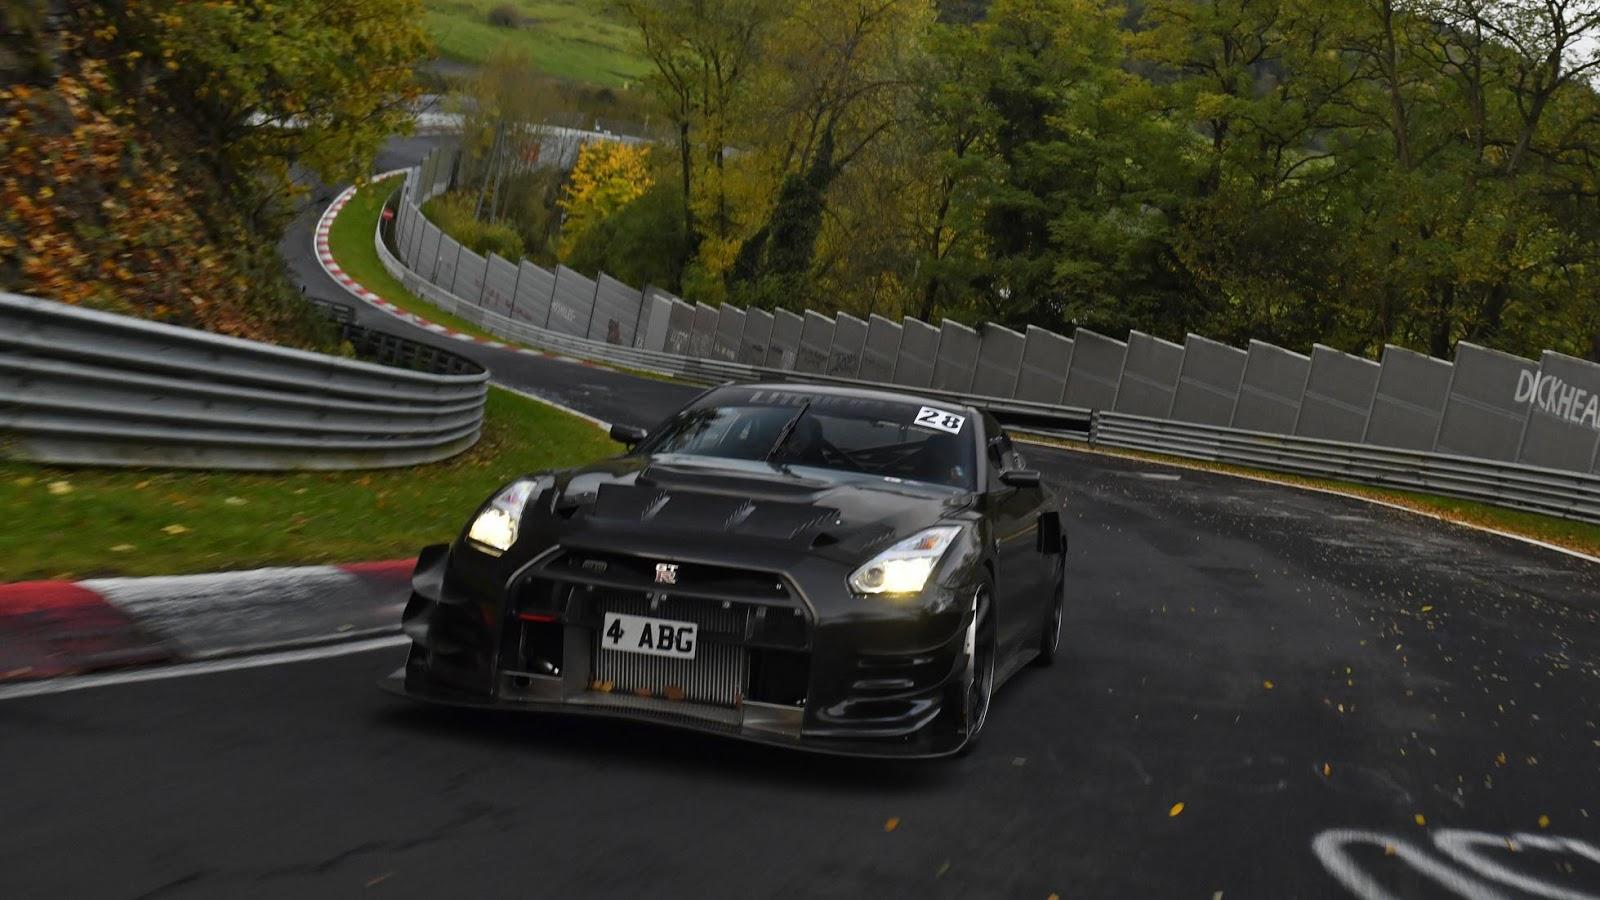 Litchfield-Nissan-GT-R-Nurburgring-2